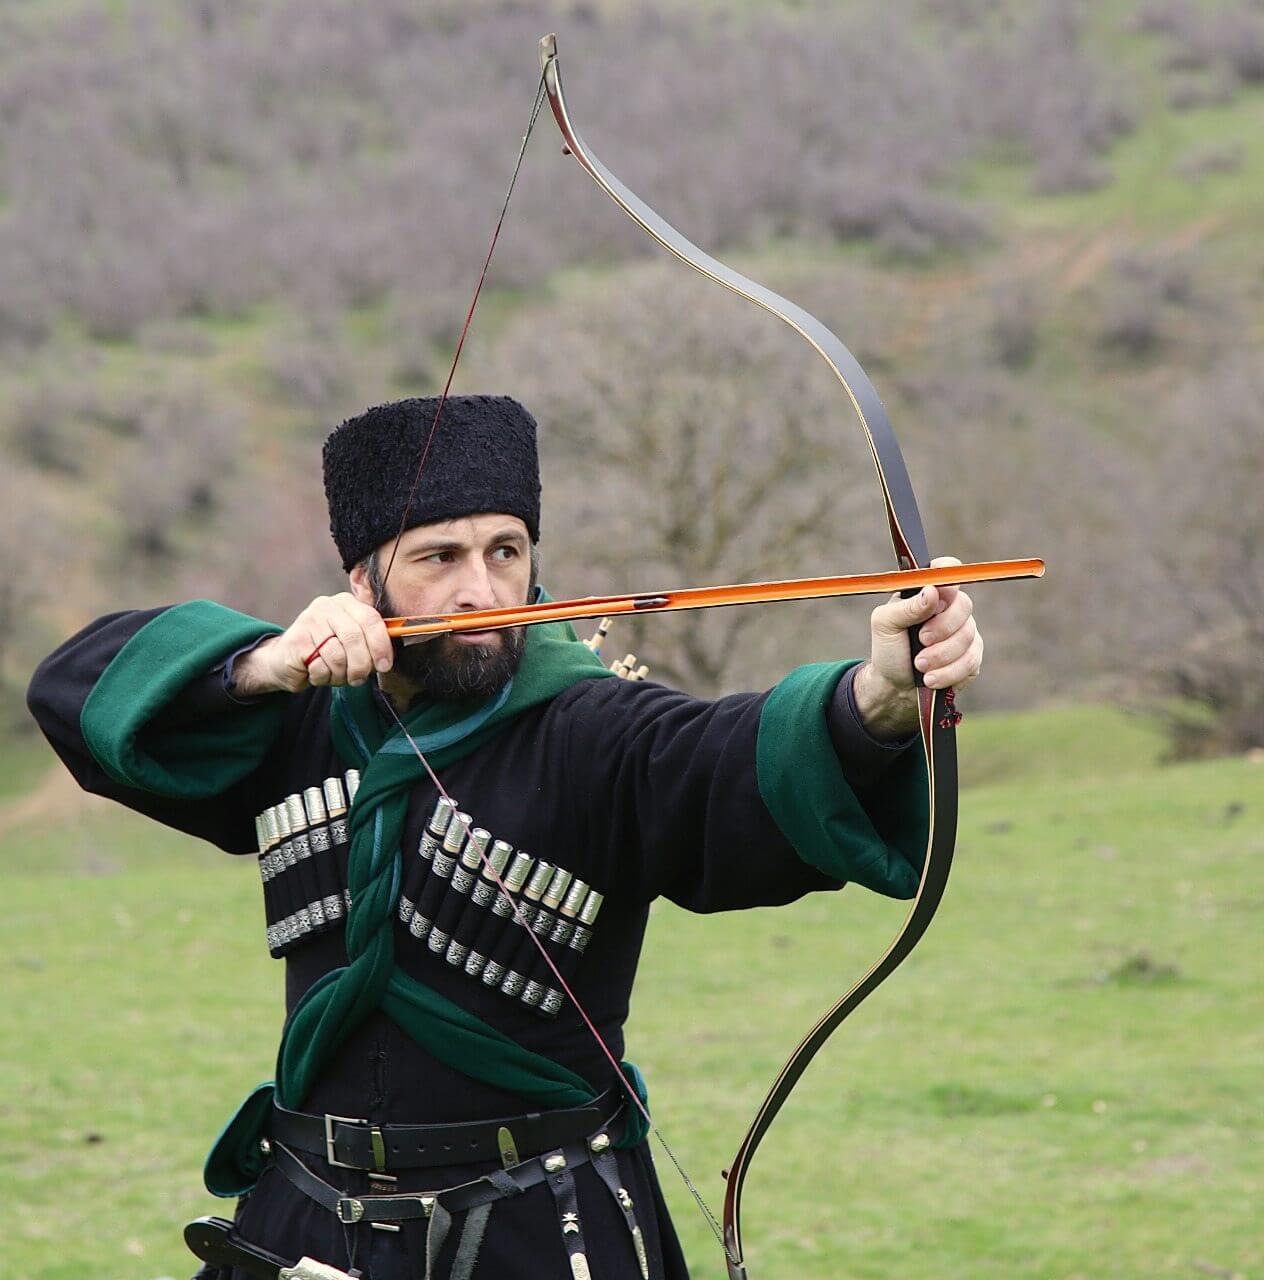 Dagestanian jigits with KadysBows bows